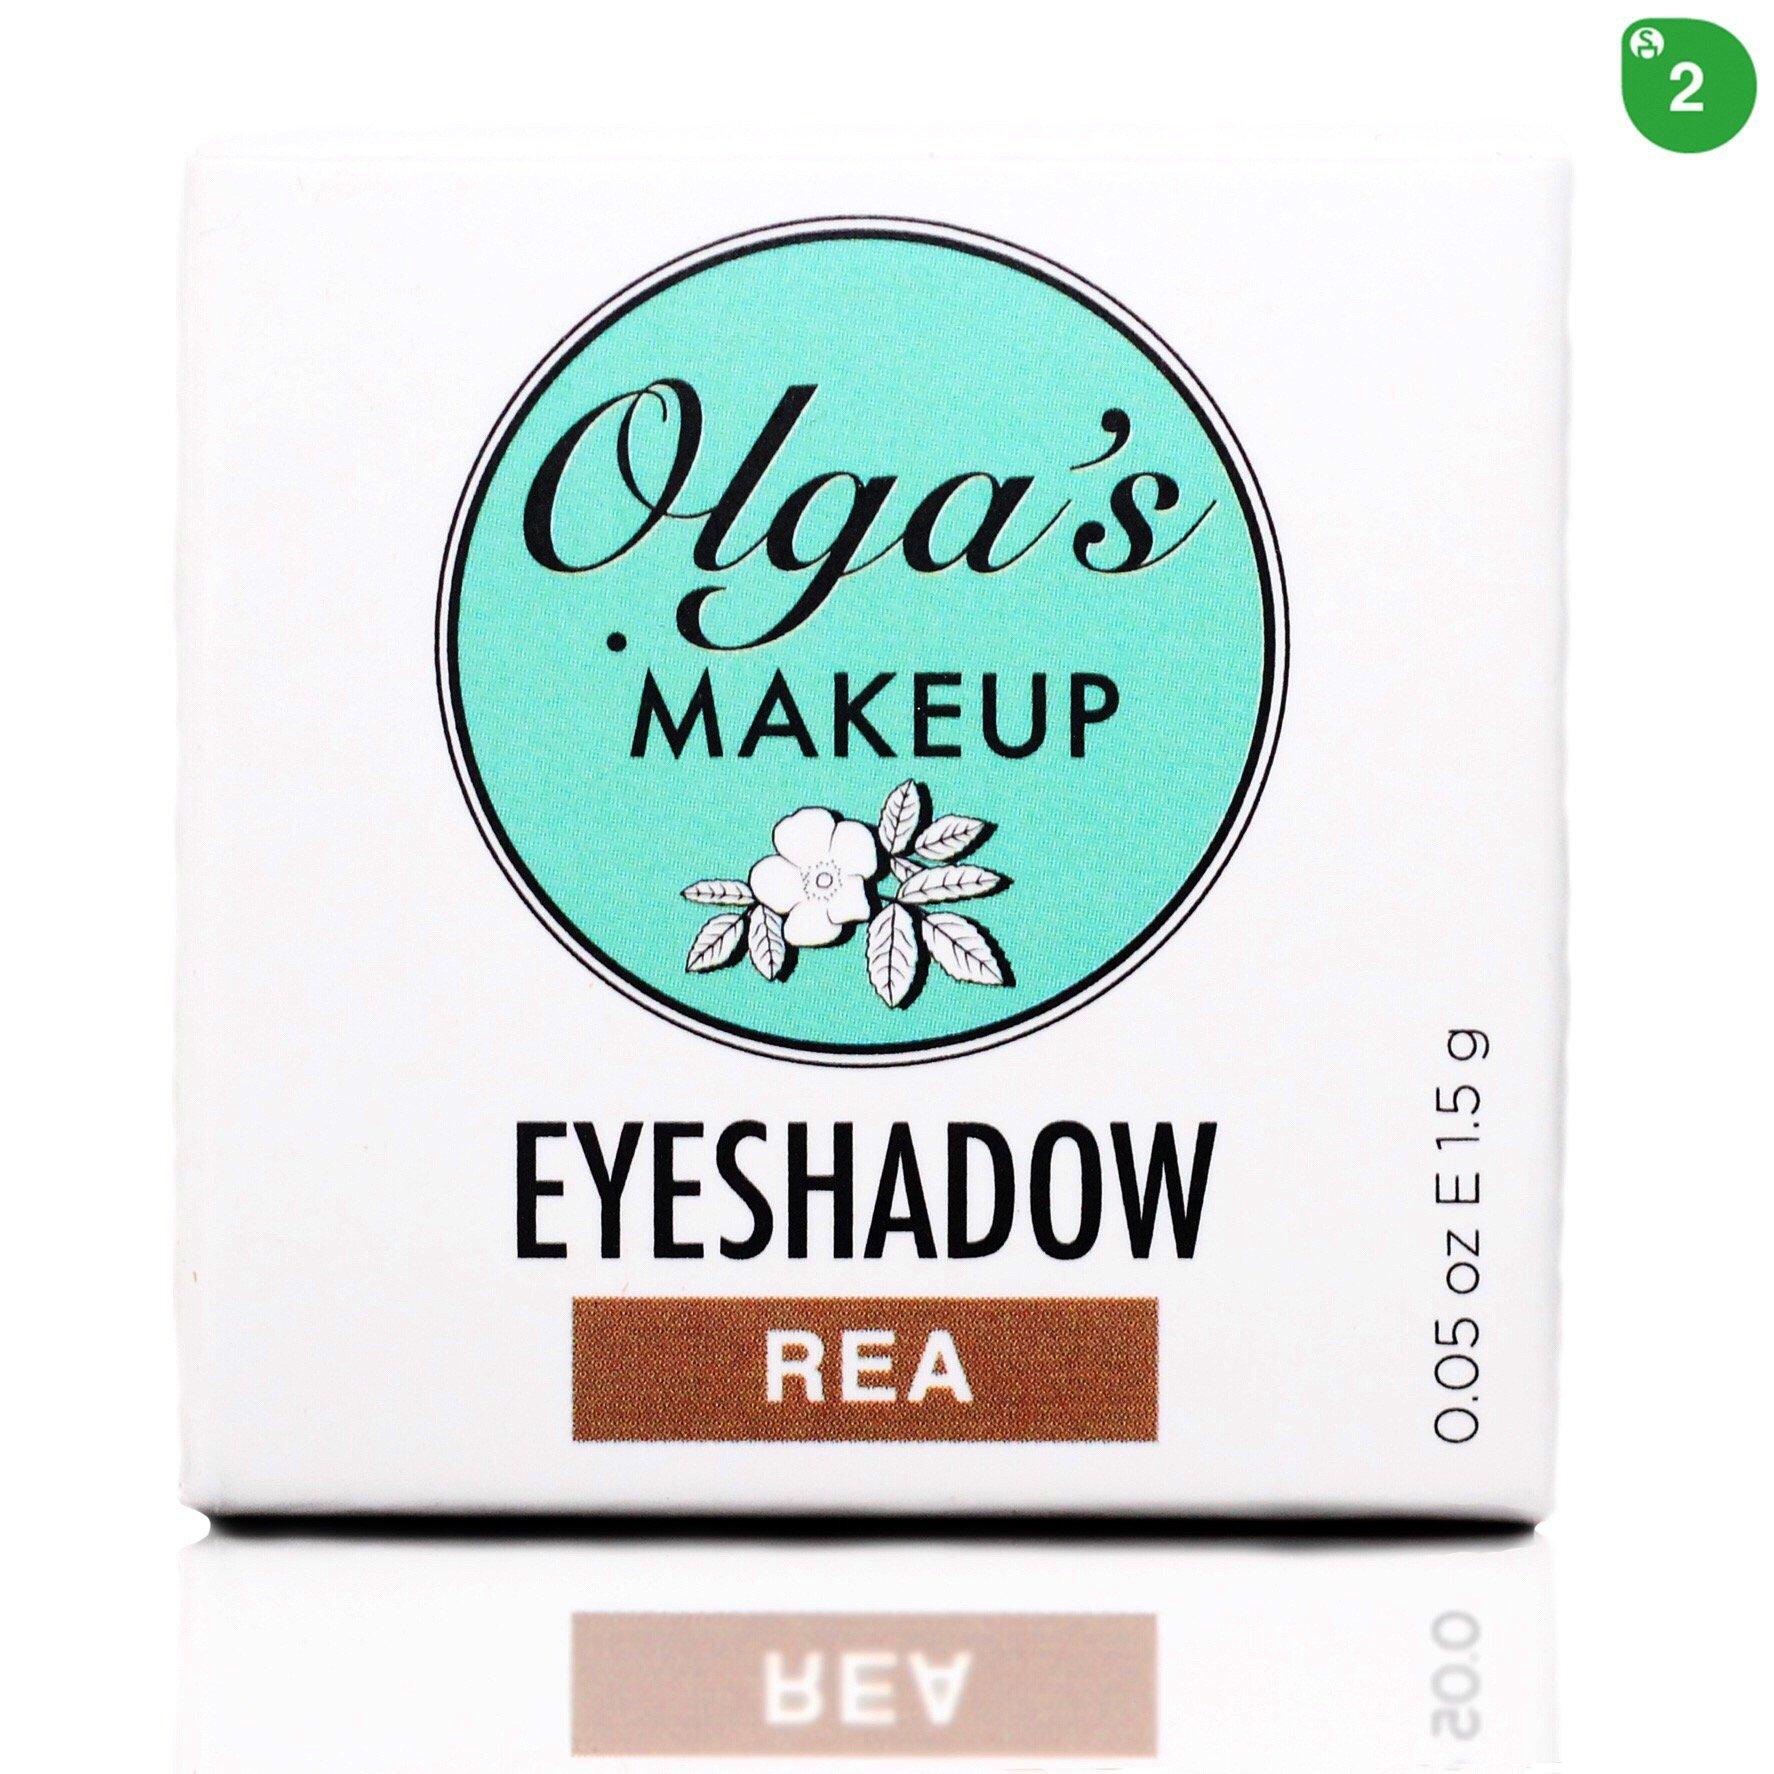 Organic & Mineral Eyeshadow - Rea